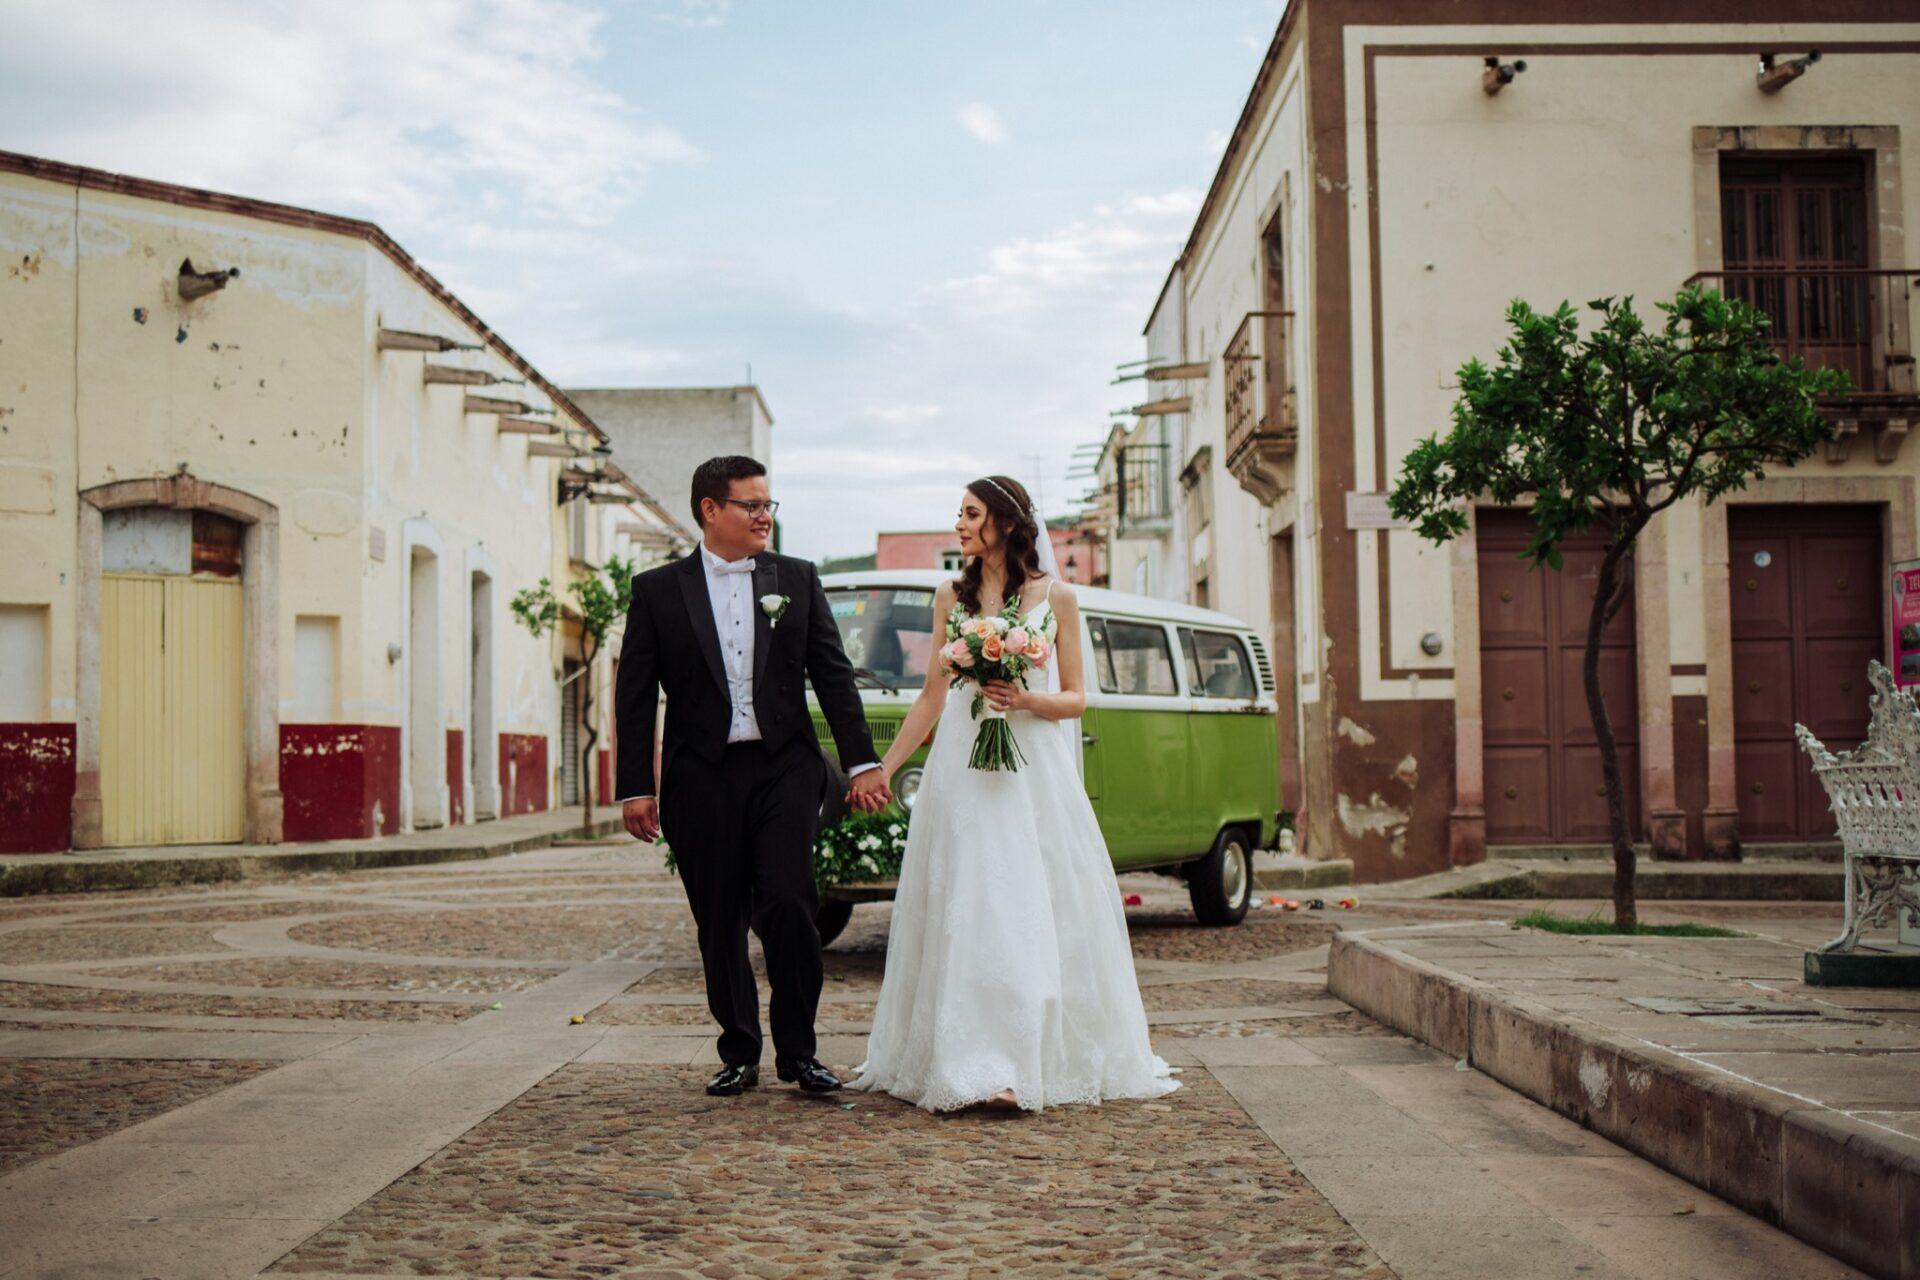 javier_noriega_fotografo_bodas_teul_zacatecas_wedding_photographer19a